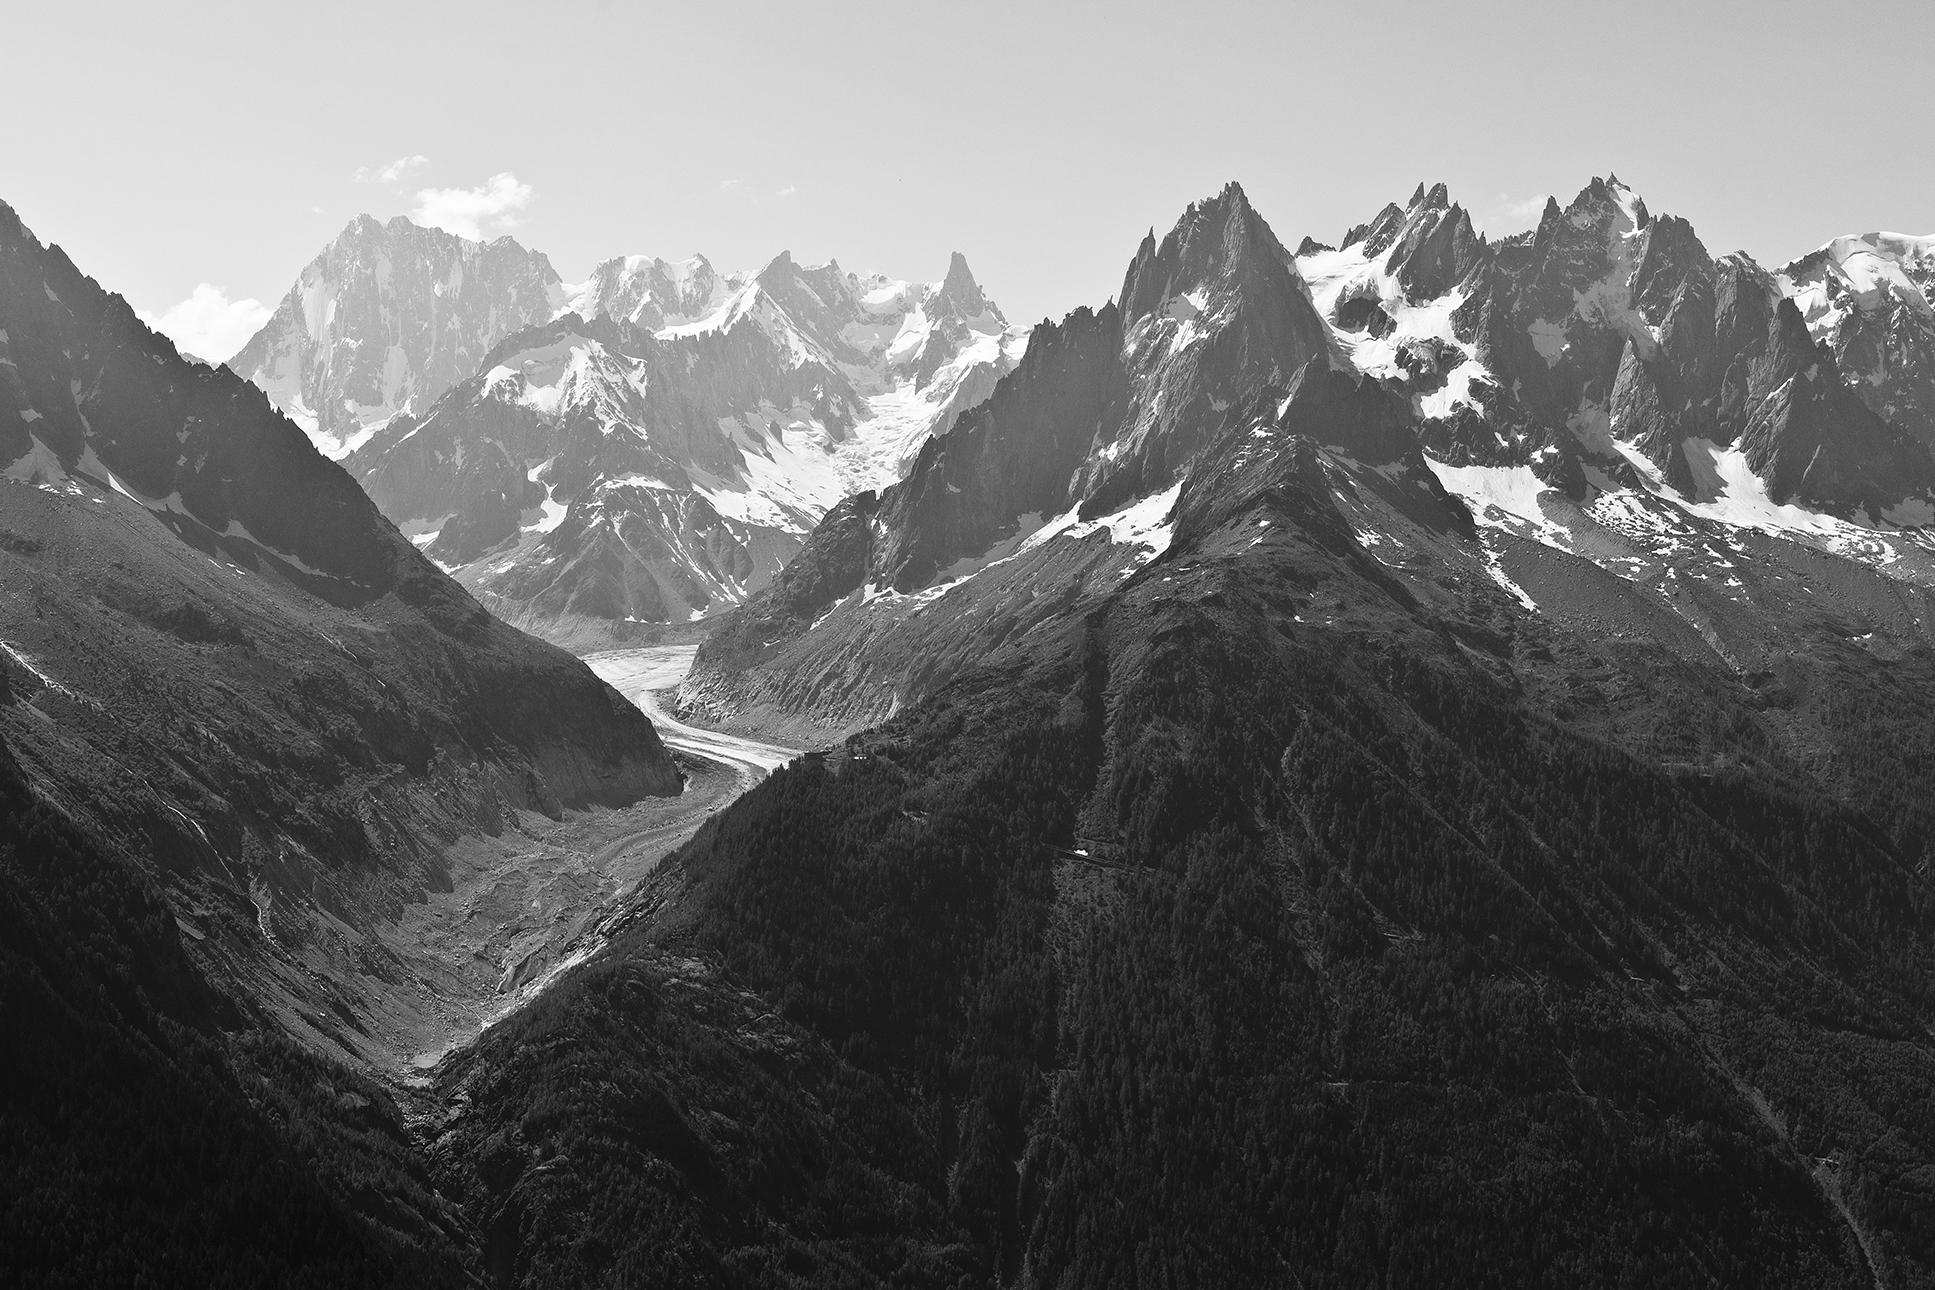 mer-de-glace-Chamonix-juillet-2013.jpg